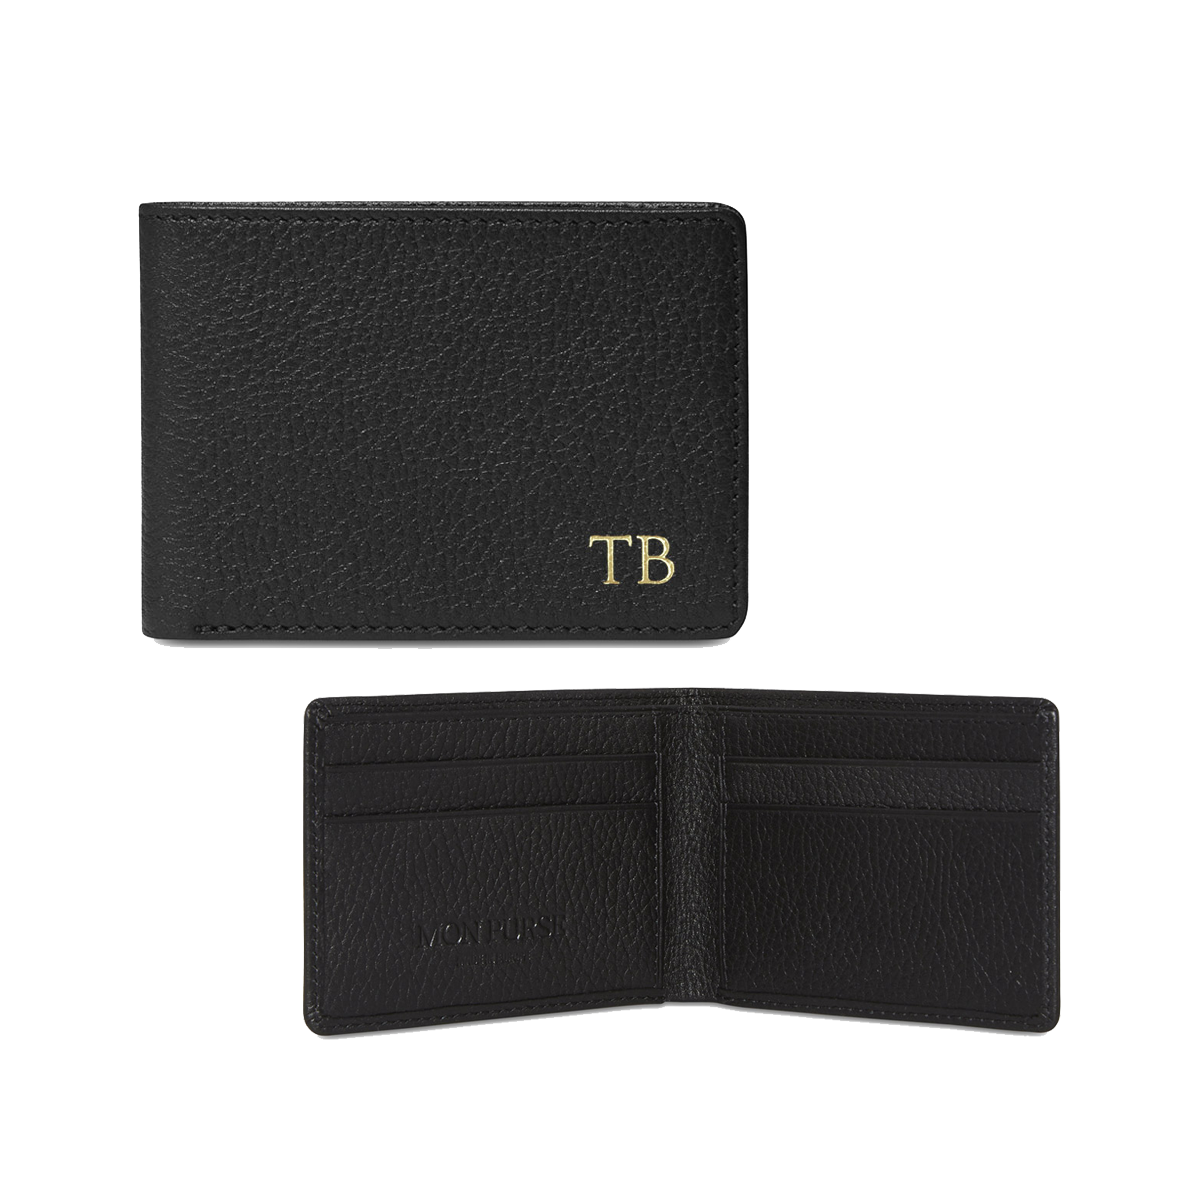 grainy-mens-wallet-black-black-monpurse-56896-2.png